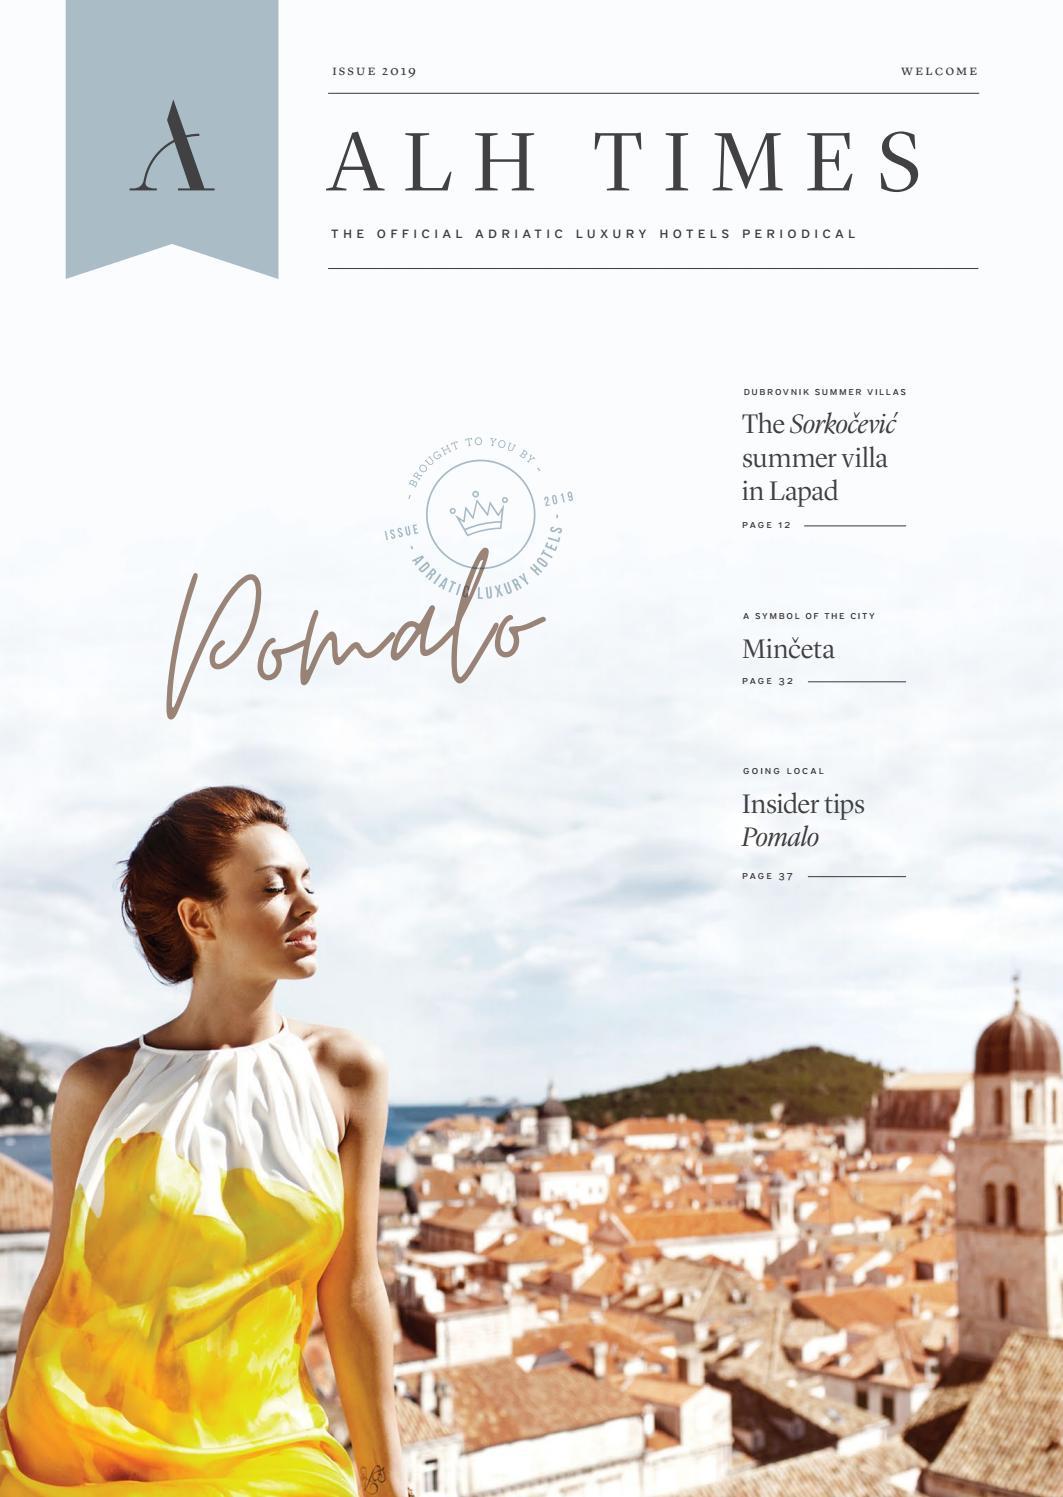 ALH Times - 2019 edition by Adriatic Luxury Hotels - issuu